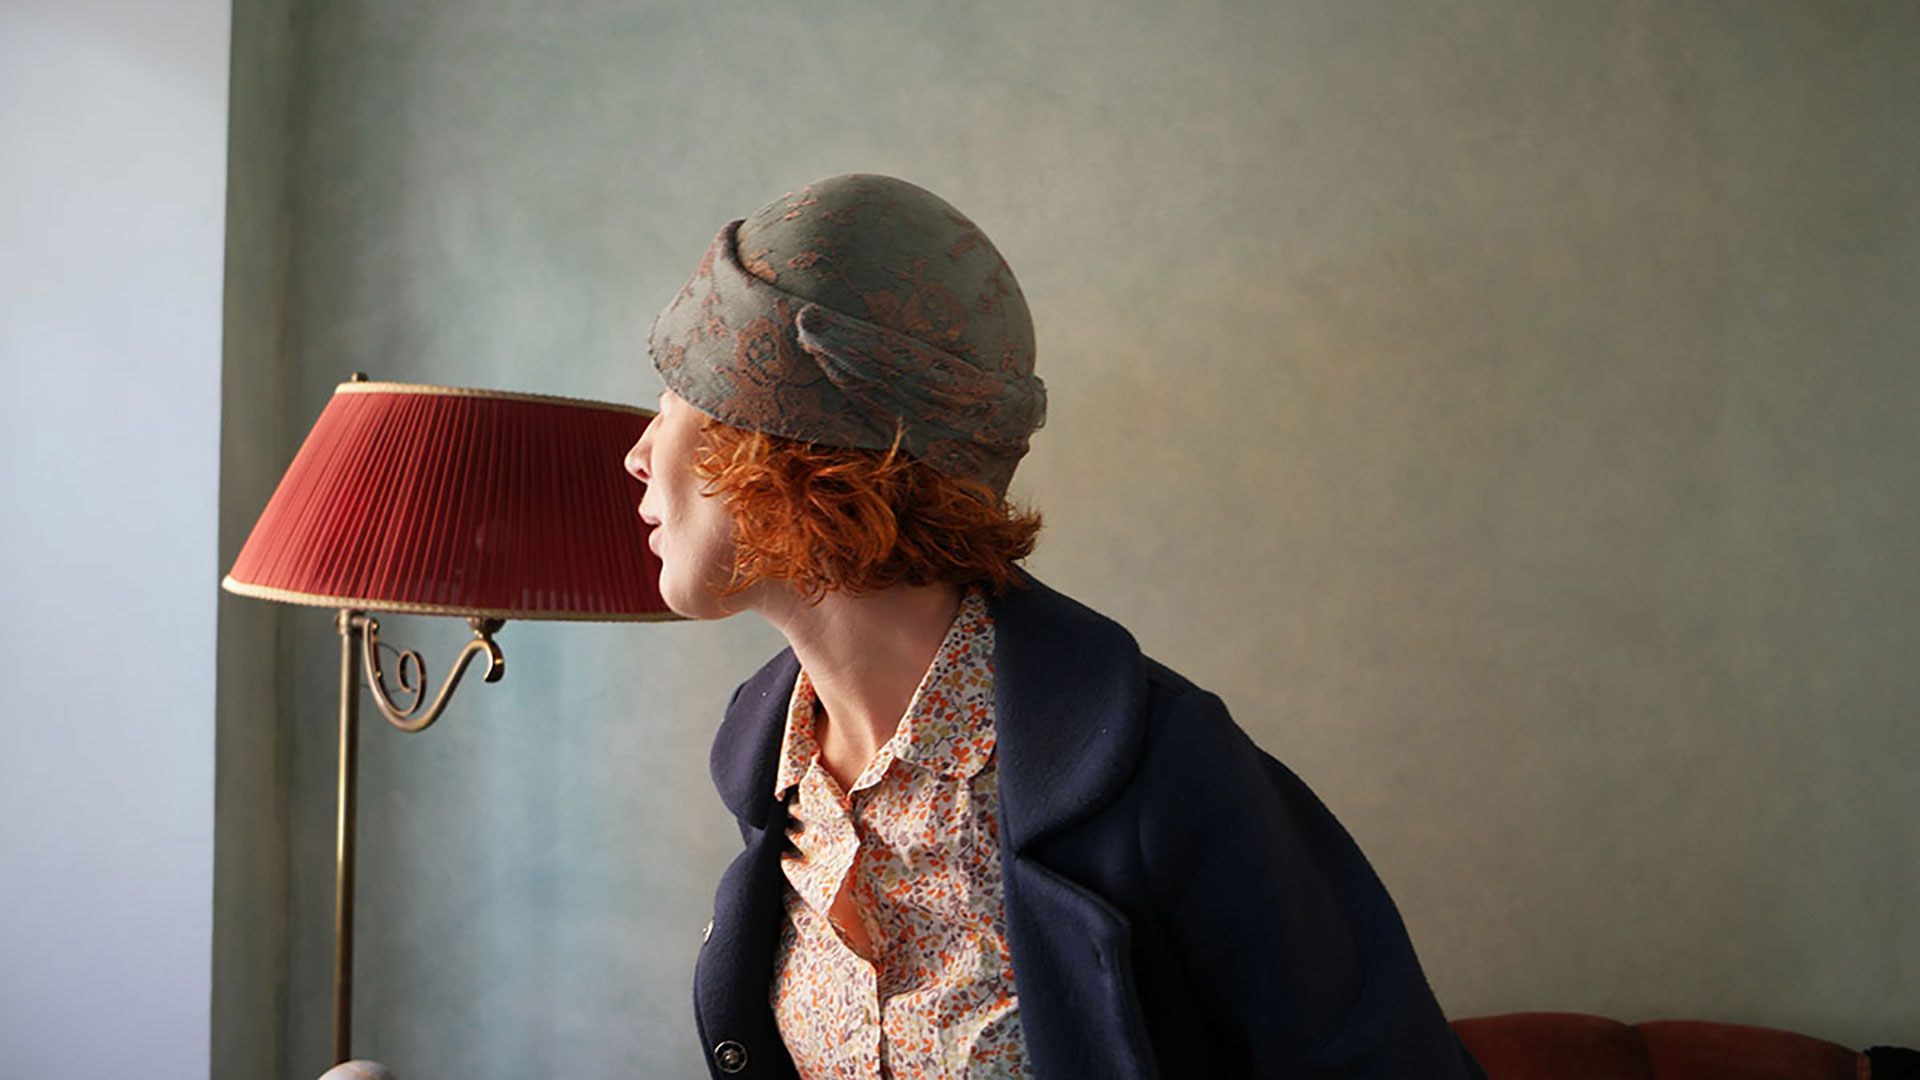 cappello artigianale estate Officine Lamour